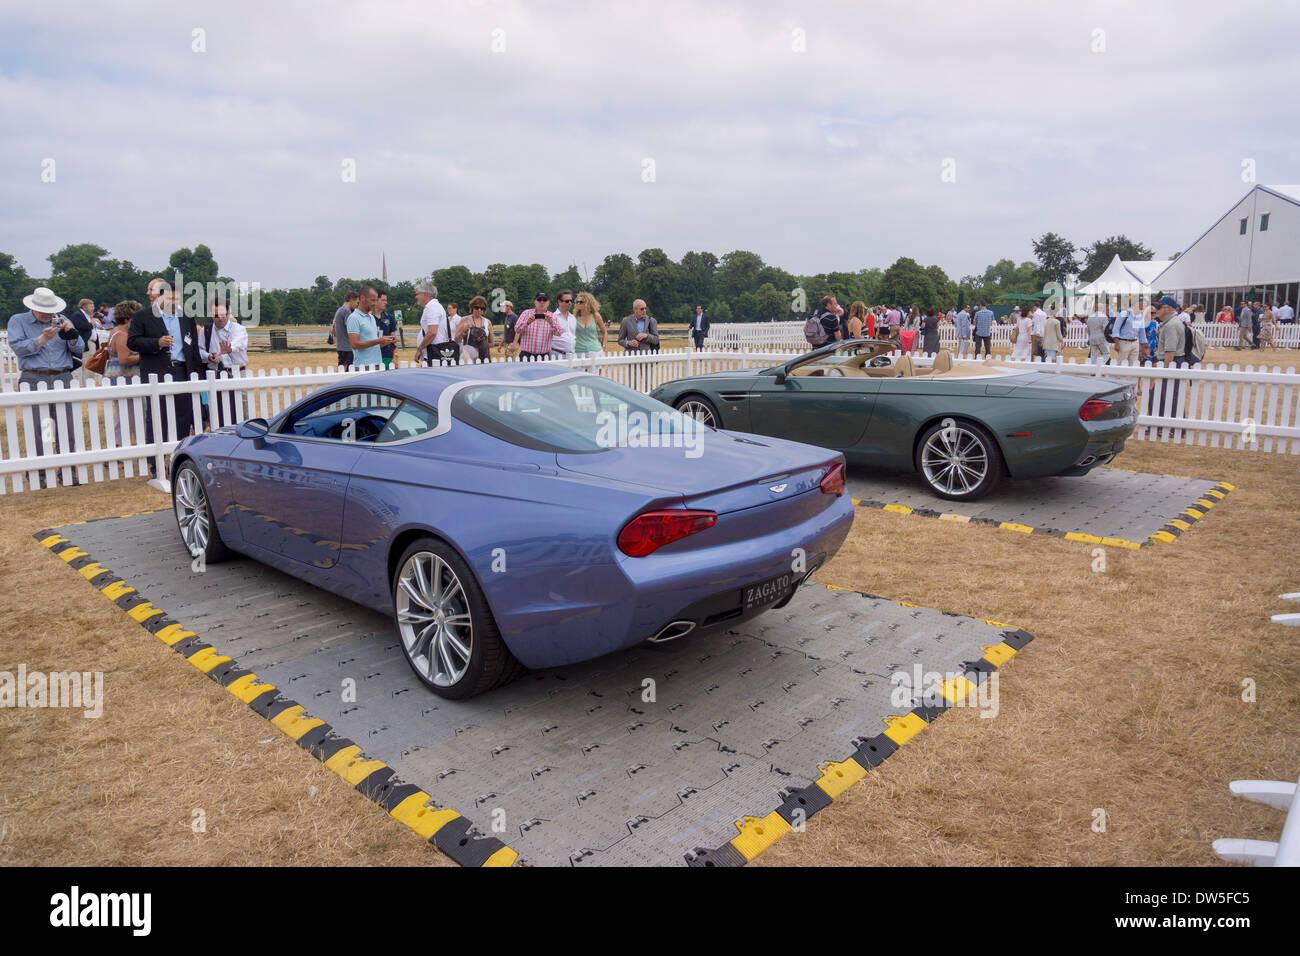 Aston Martin DBS COUPE ZAGATO CENTENNIAL (2013), Aston Martin Timeline, Centenary Celebration 2013, 100 years Aston Stock Photo